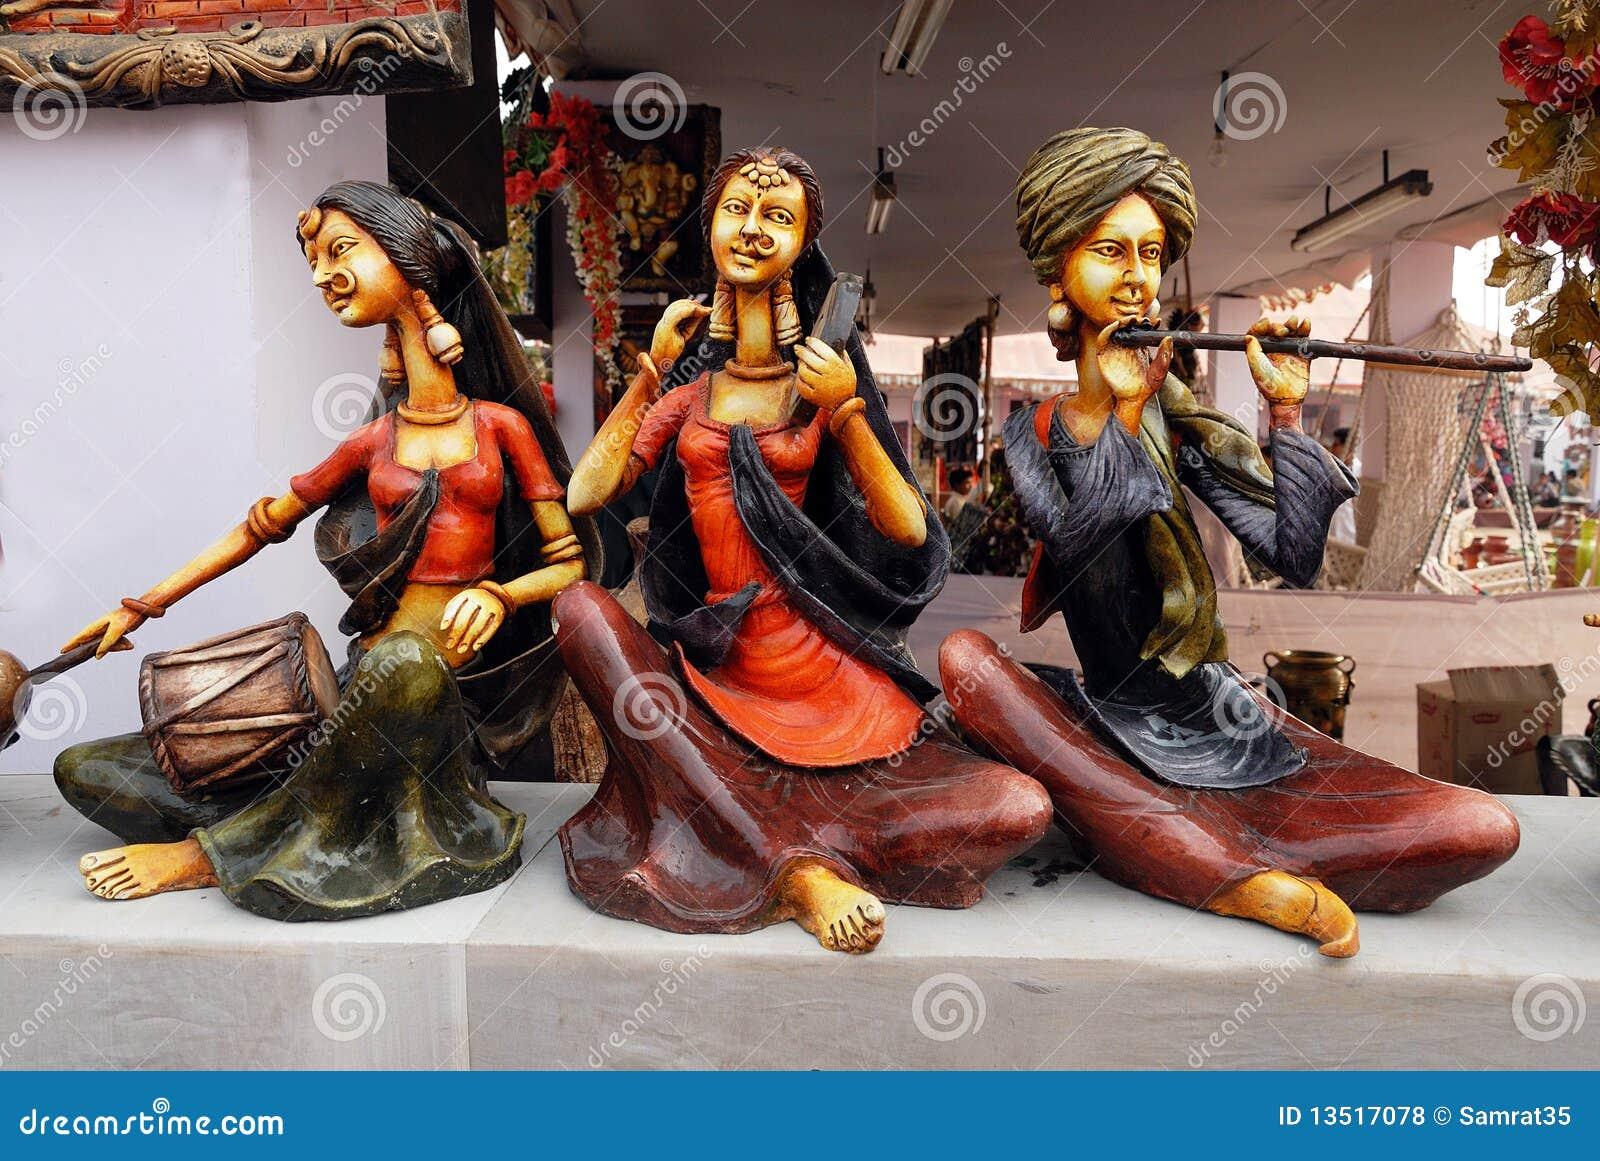 Handicrafts Of India Stock Photo Image Of Handicrafts 13517078